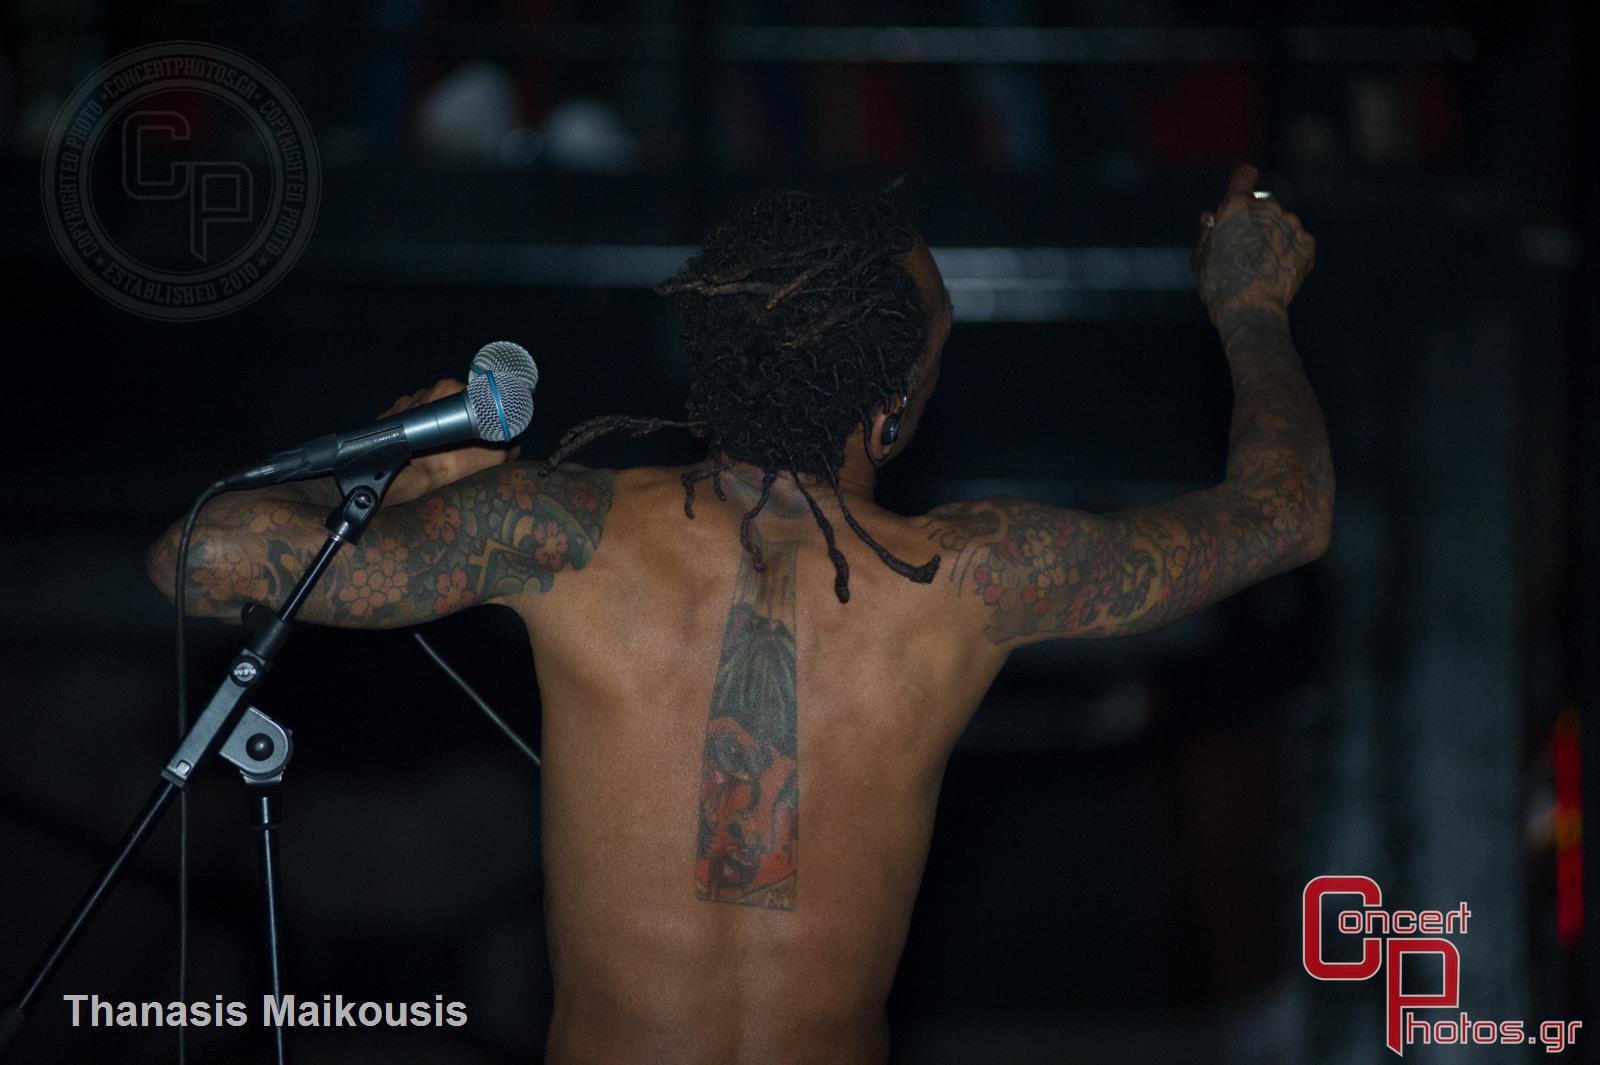 Tricky - Spectralfire-Tricky - Spectralfire photographer: Thanasis Maikousis - concertphotos_-4039